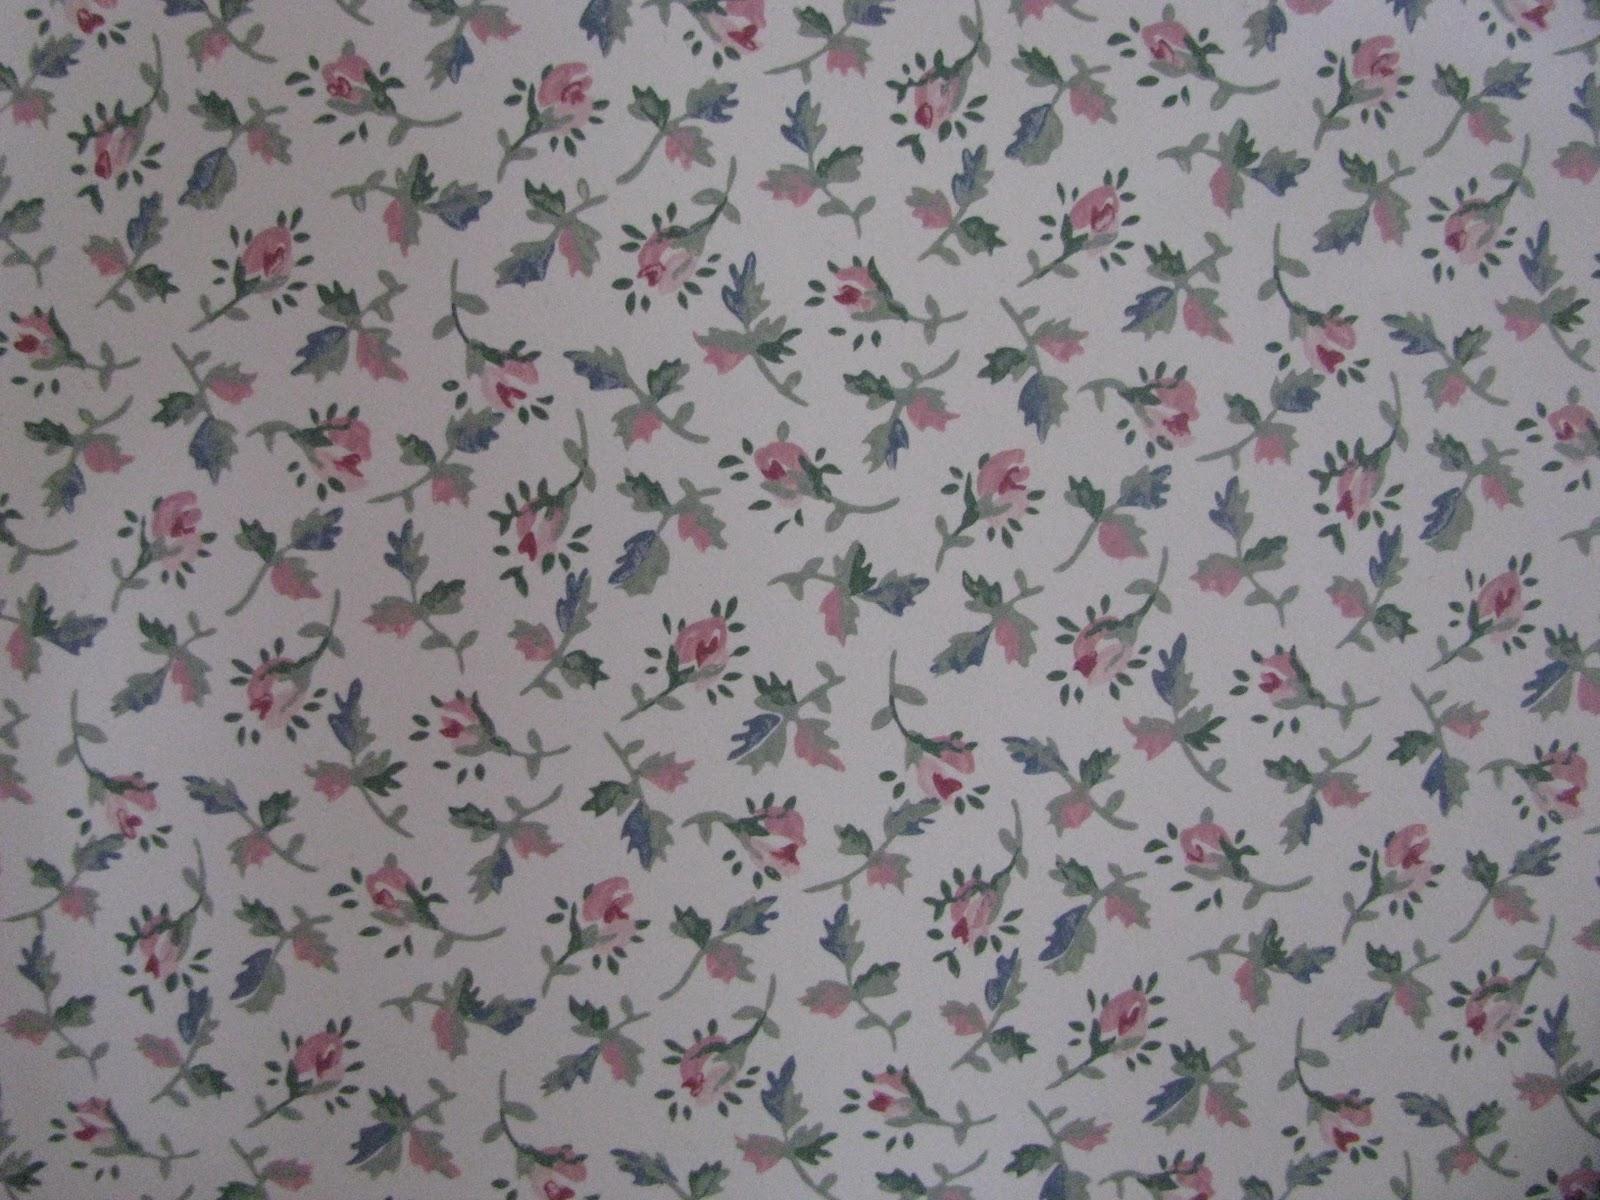 http://3.bp.blogspot.com/_dk_7oQhMH0g/TRFpjojN2XI/AAAAAAAAAh4/r_bV2tUsSVk/s1600/Wallpaper+close+up.JPG